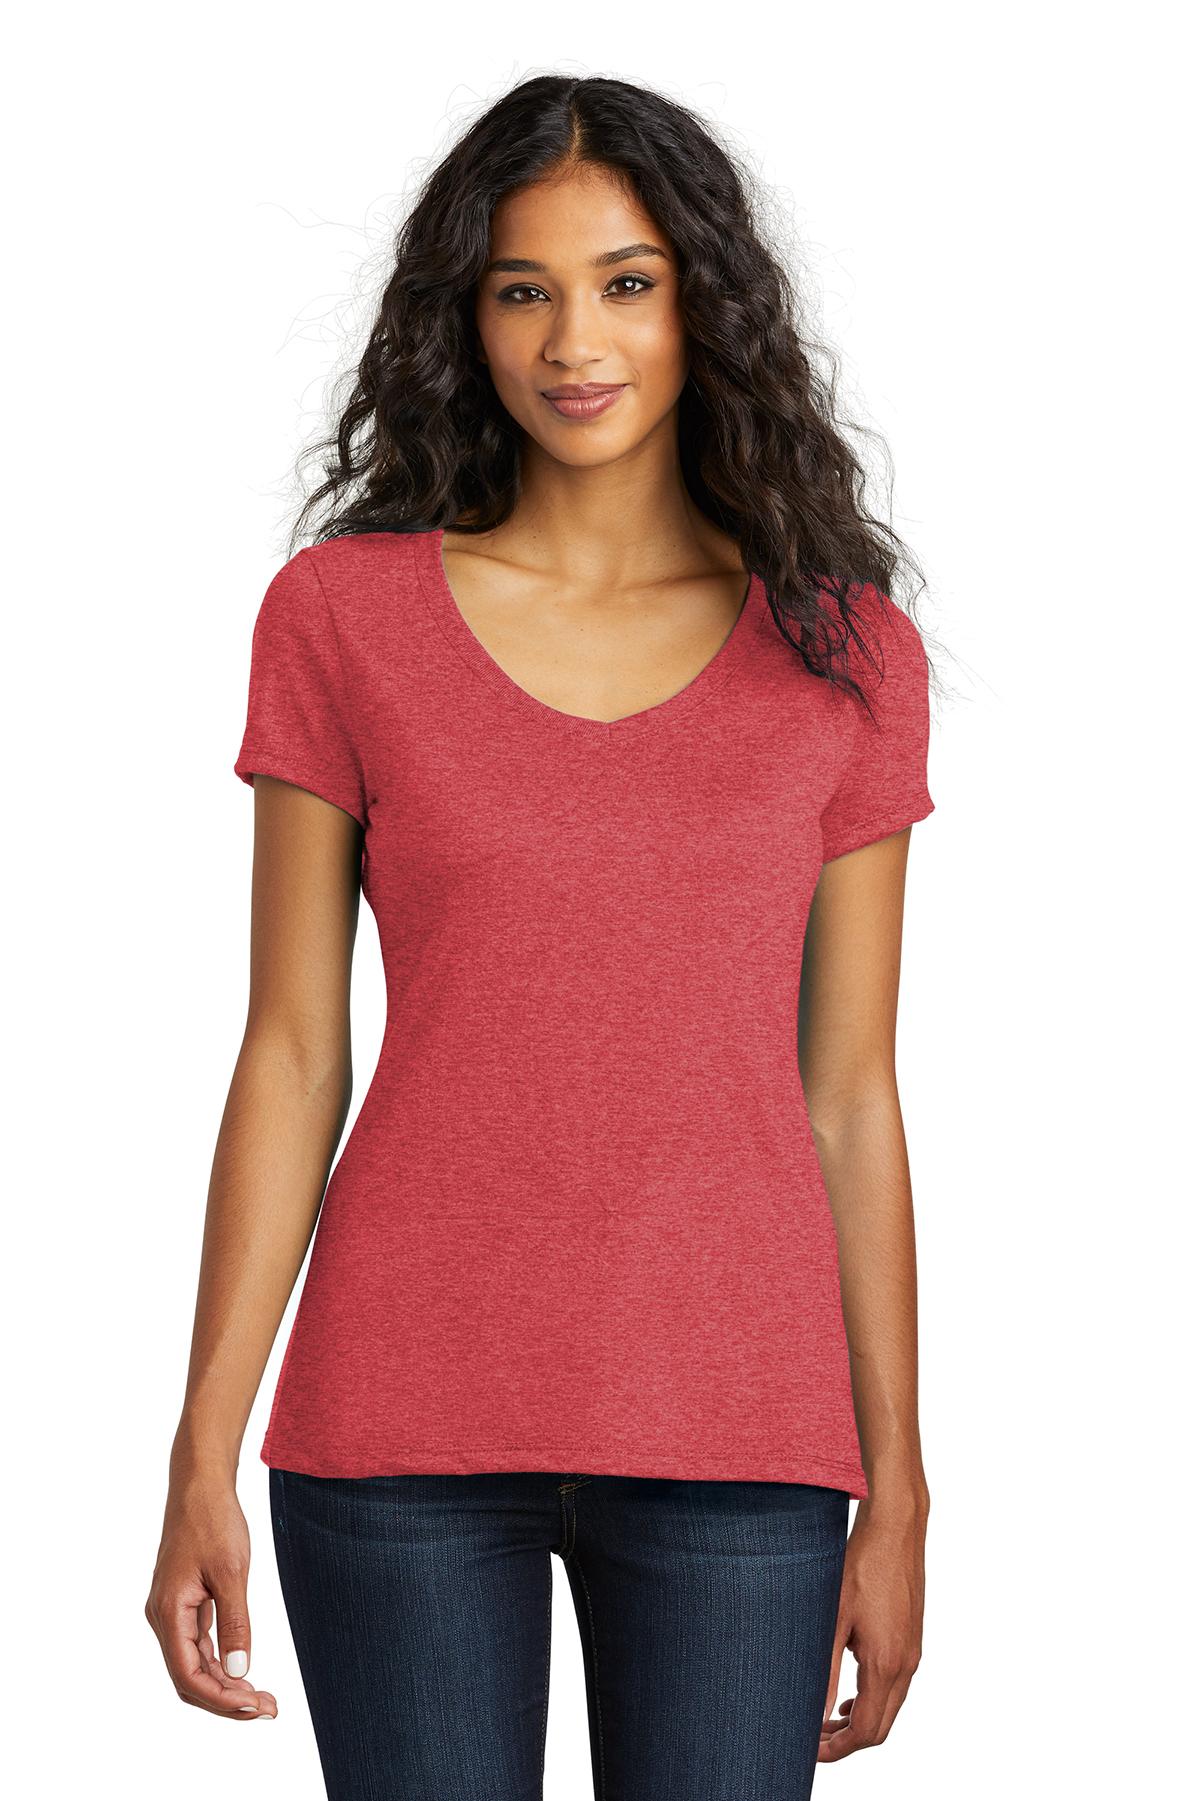 418eab615861 District ® Women's Perfect Tri ® V-Neck Tee | Ring Spun | T-Shirts ...